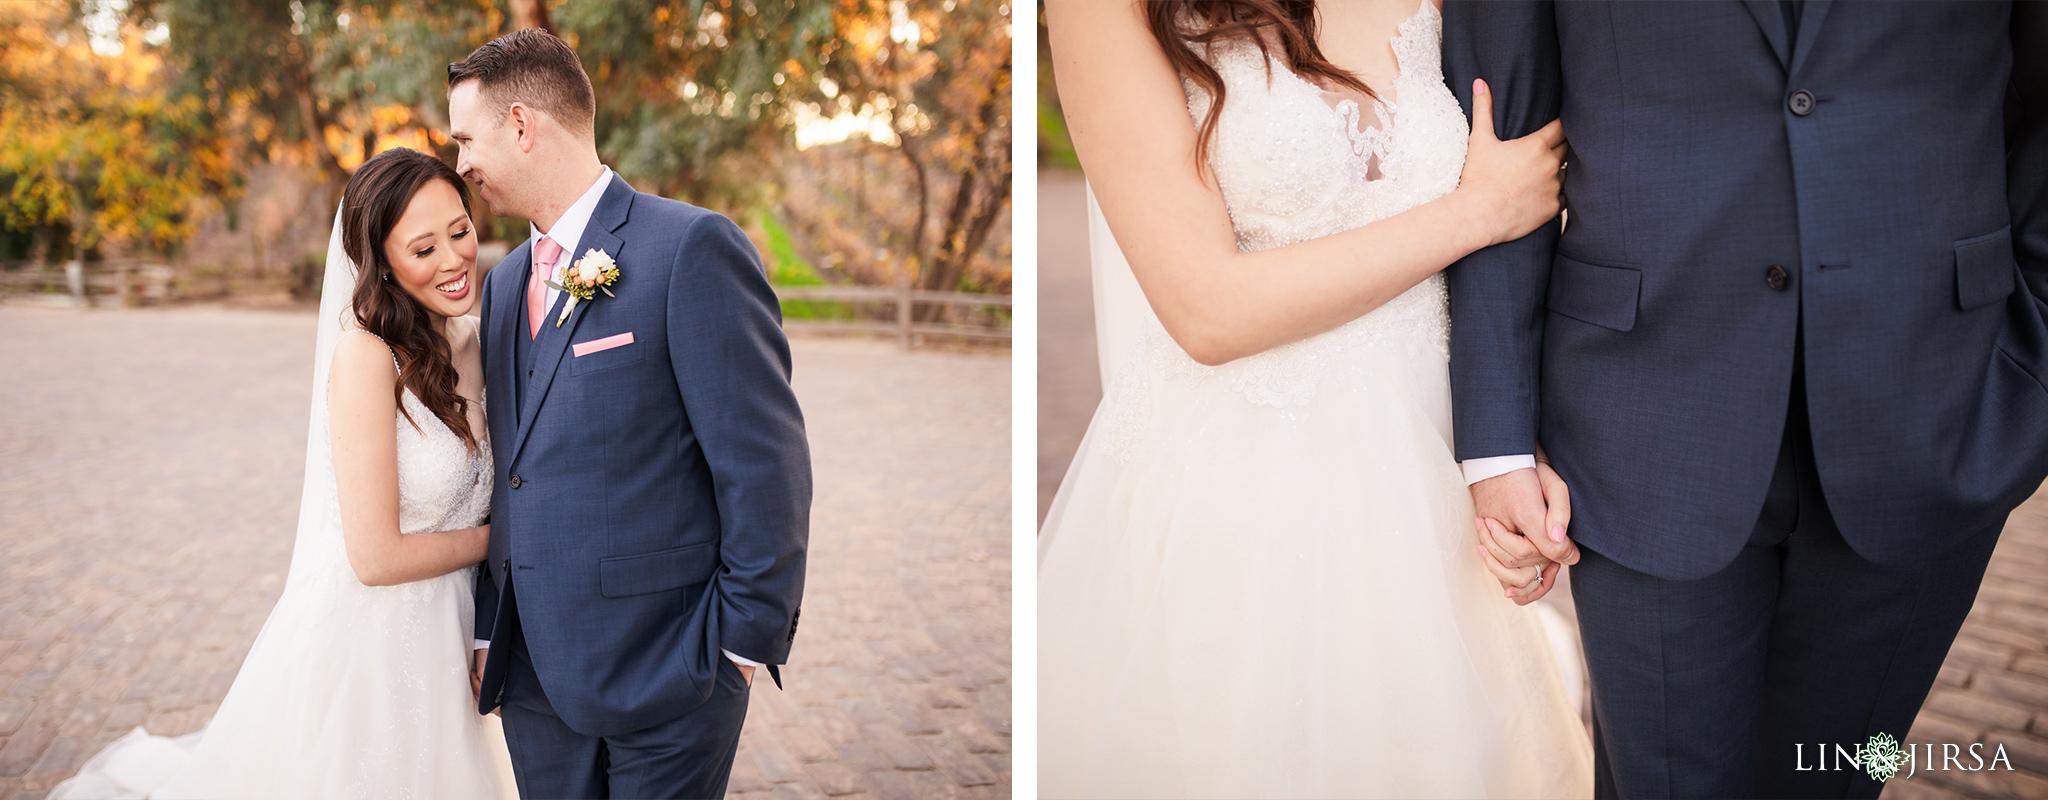 20 lake oak meadows temecula wedding photography